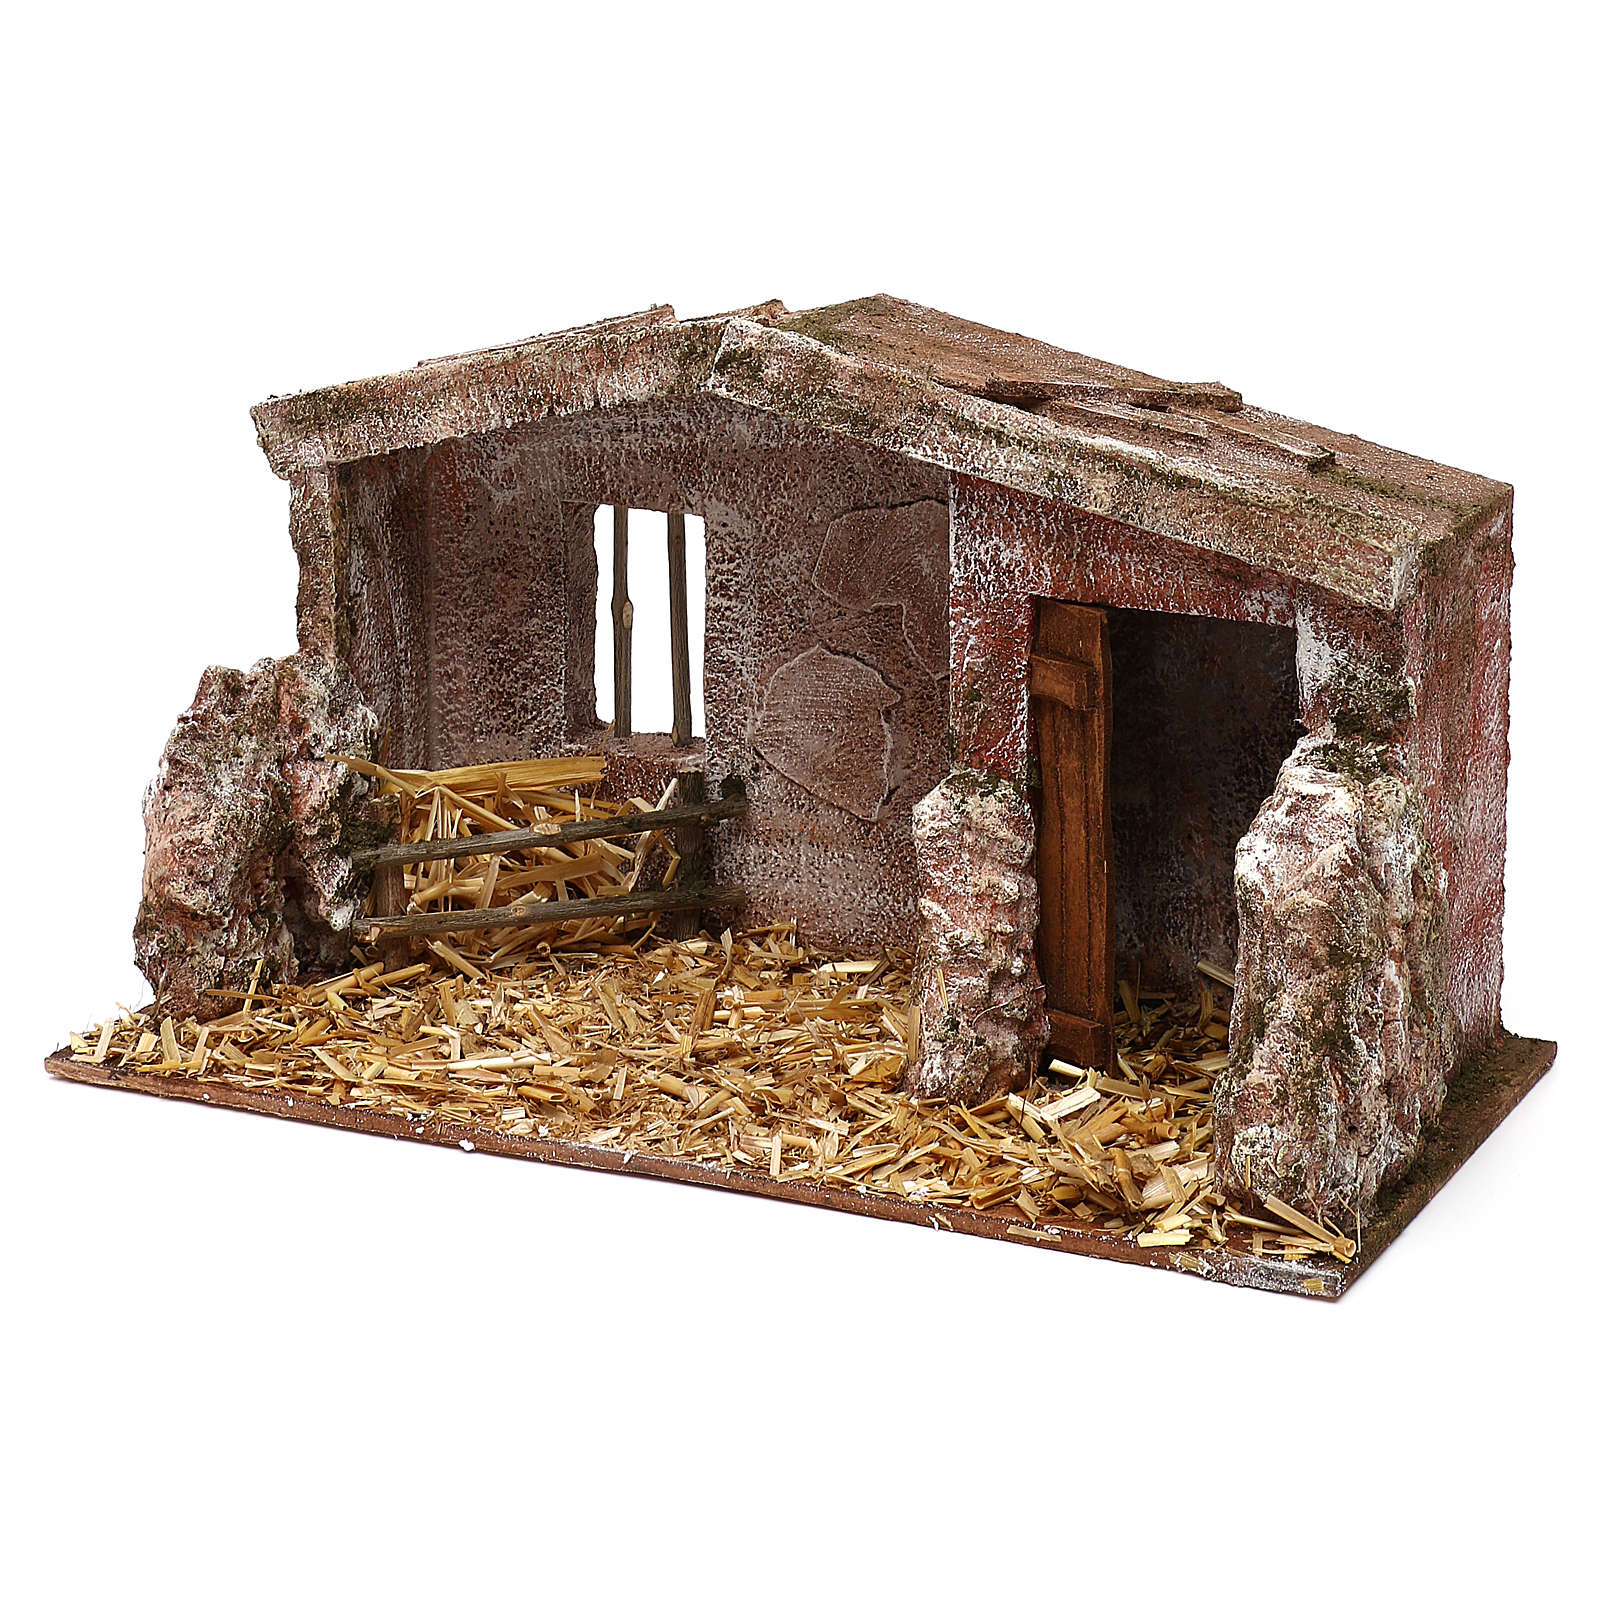 Shack with door for 12 cm Nativity scene, 20x35x20 cm 4